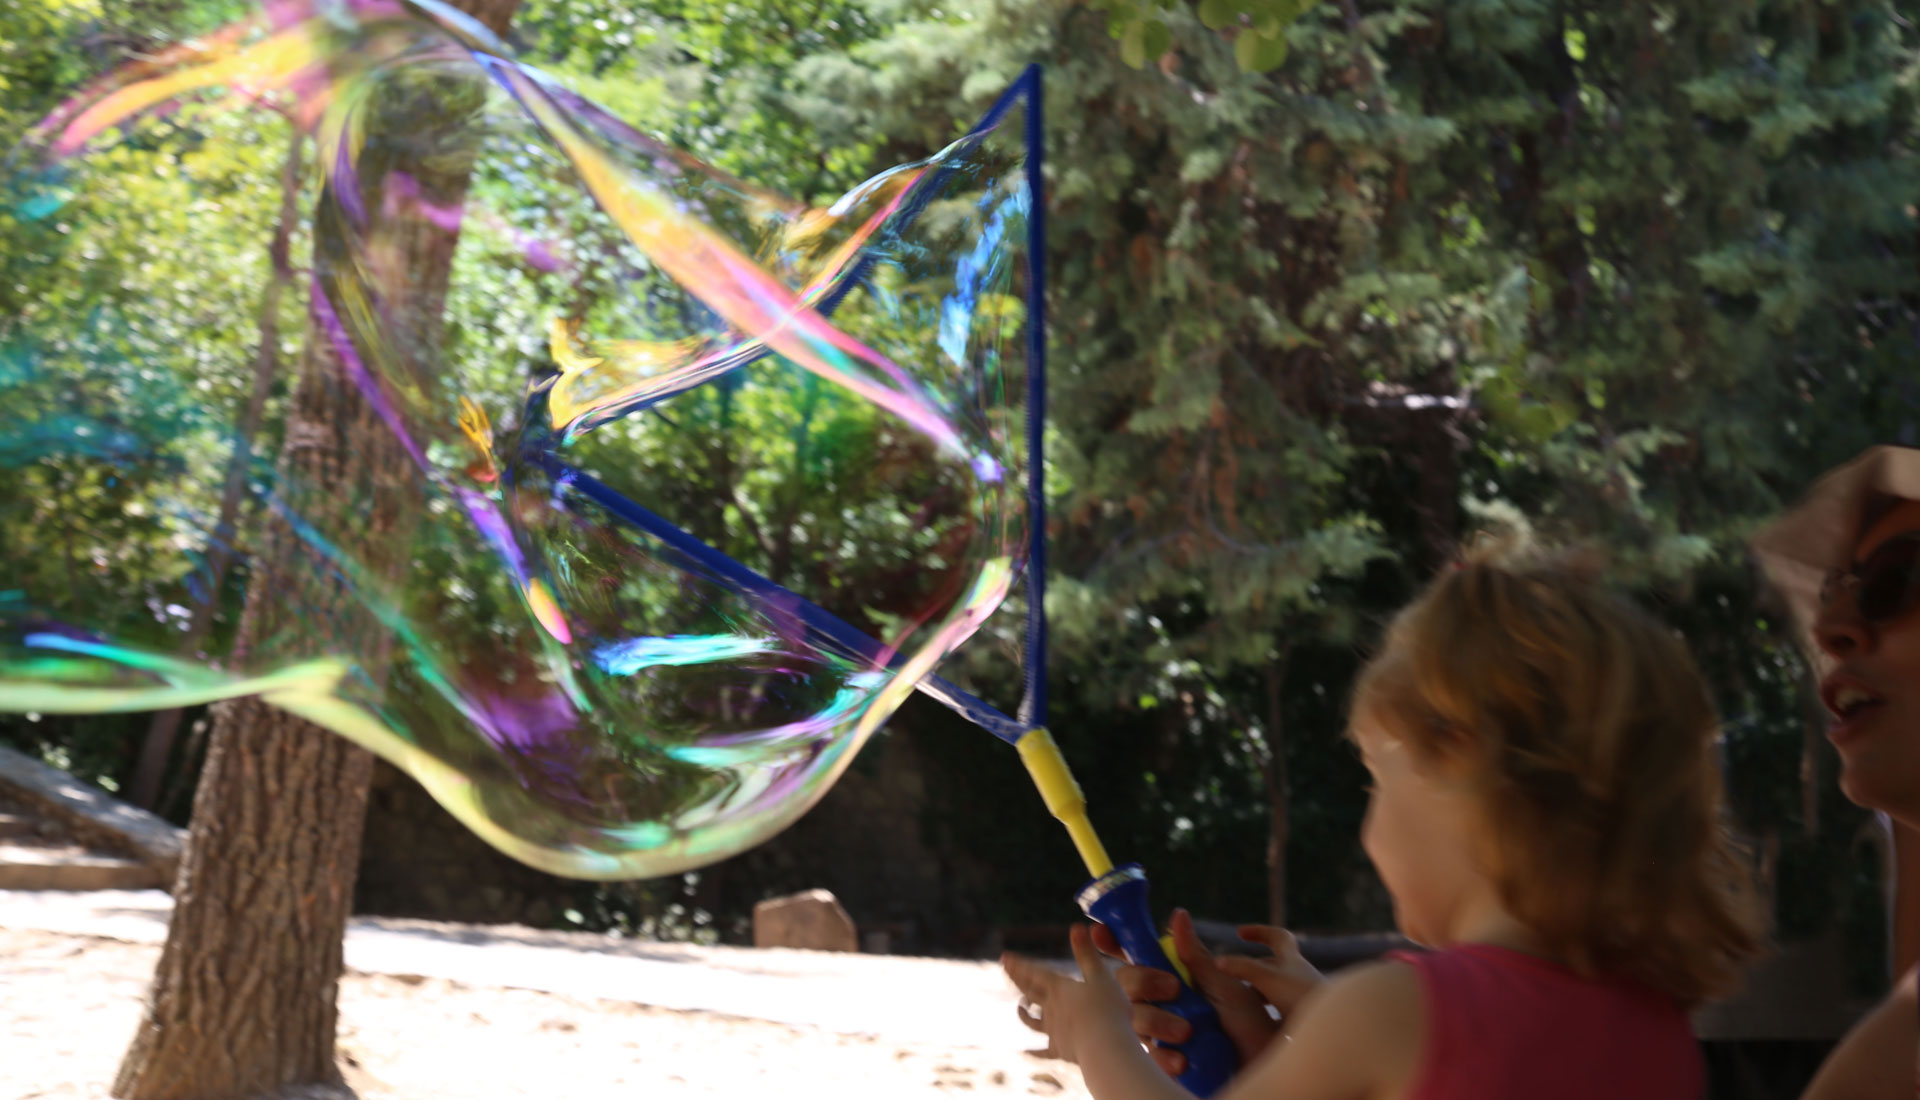 summer camp- παιγνιδια, αθληματα